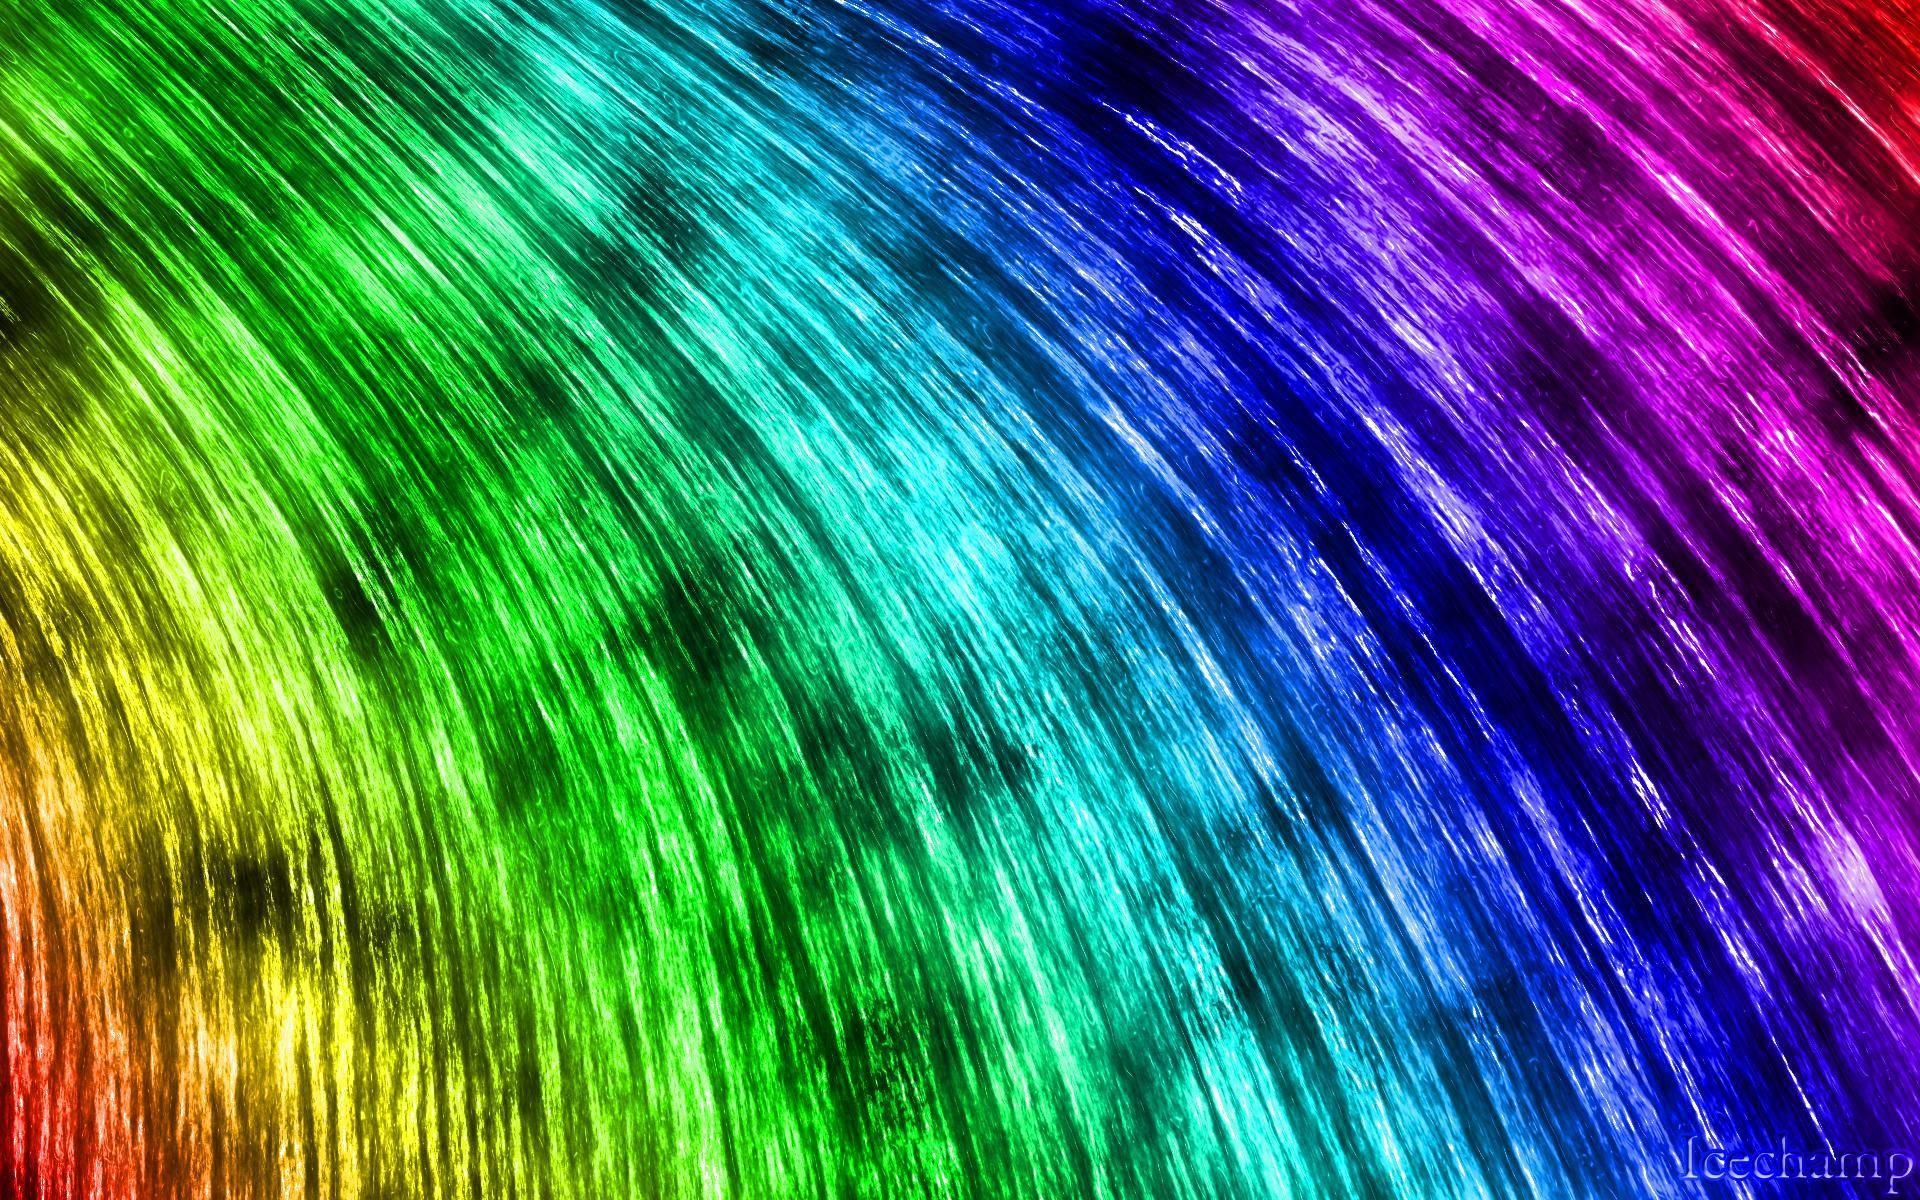 Excellent Rainbow Wallpaper Wallpapers HD Wallpaper x